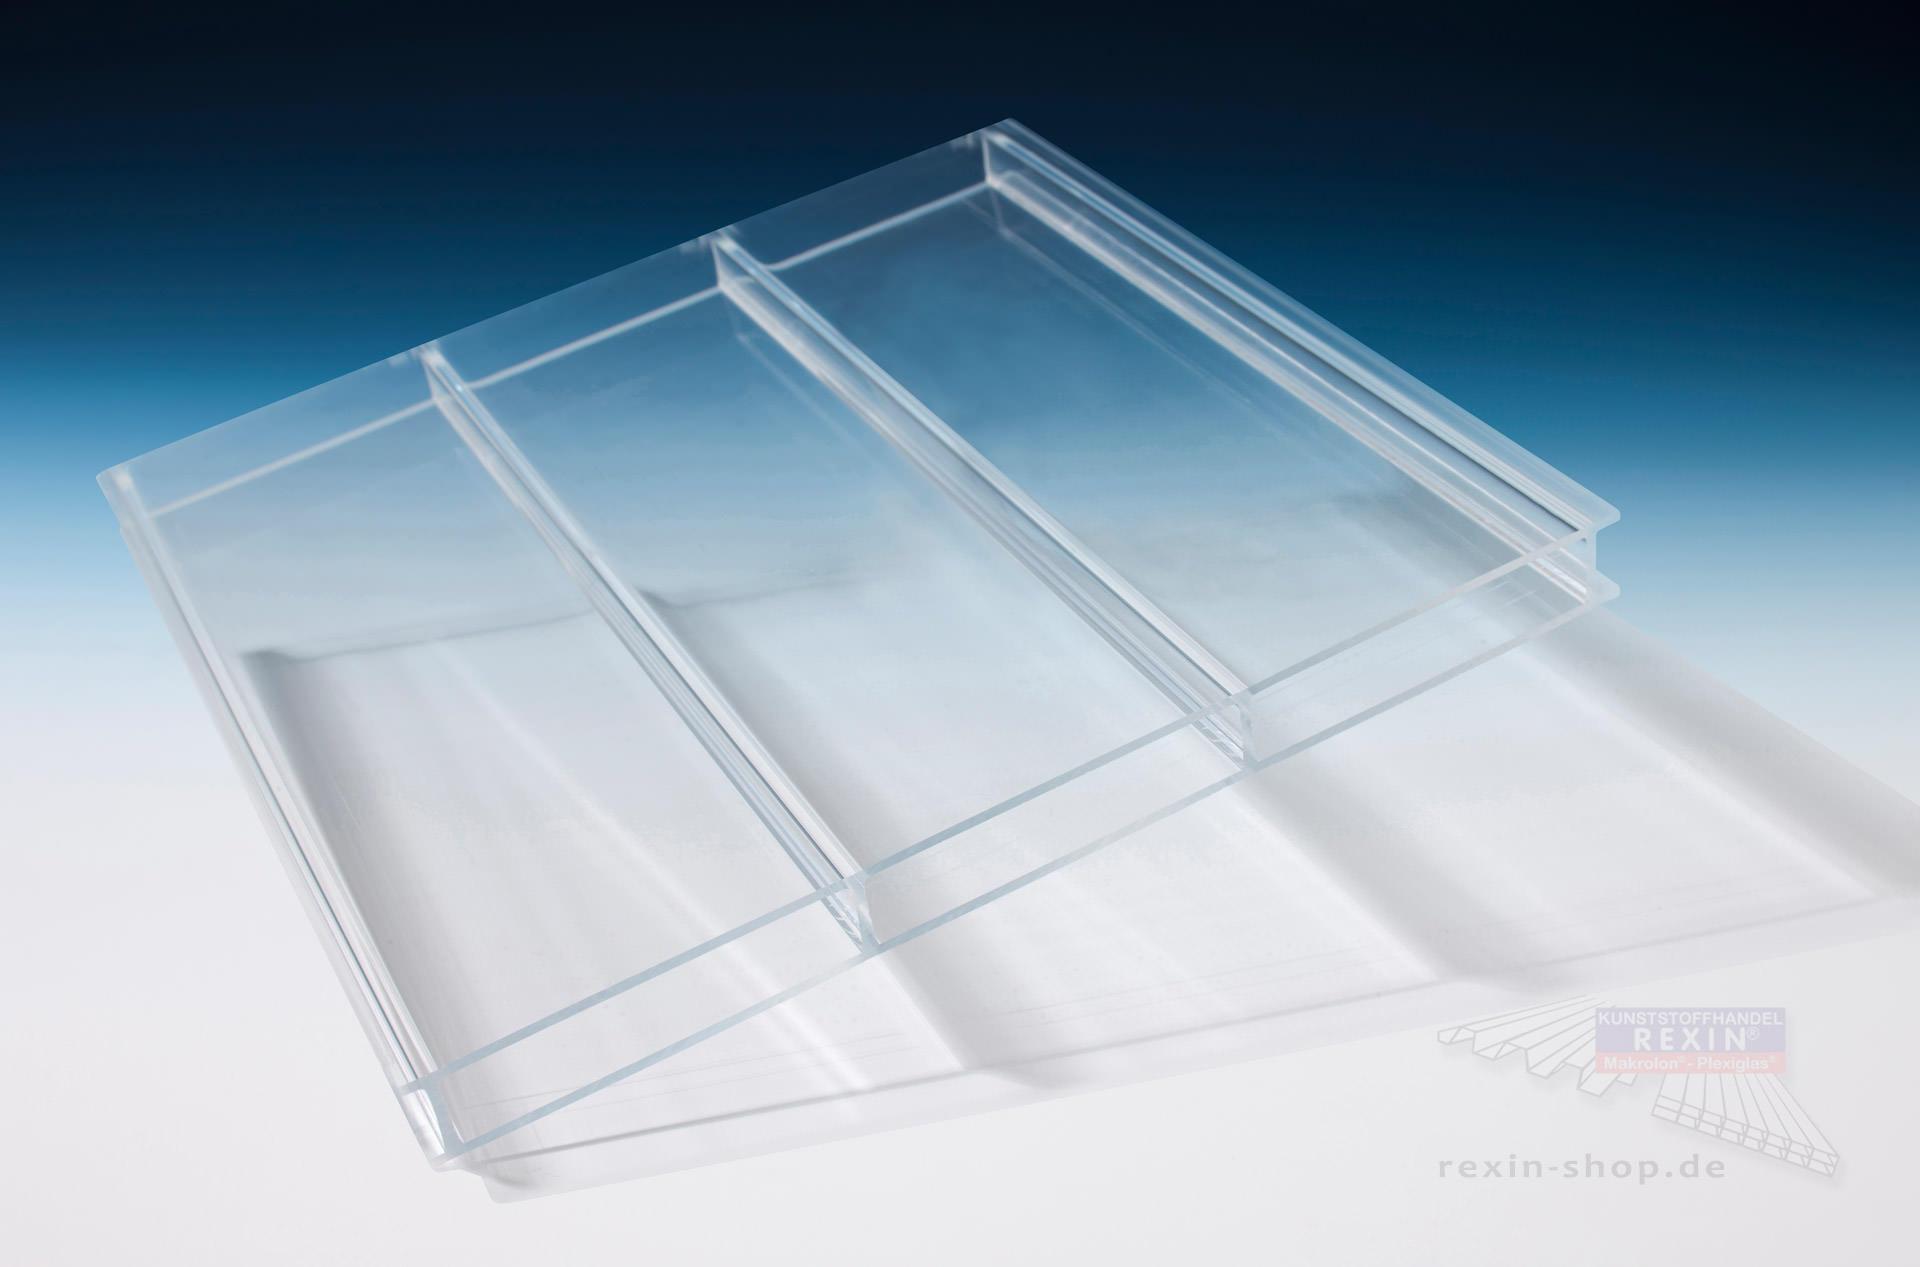 plexiglas alltop 2 fach stegplatte 16mm transparent plexiglas alltop 2 fach stegplatte. Black Bedroom Furniture Sets. Home Design Ideas